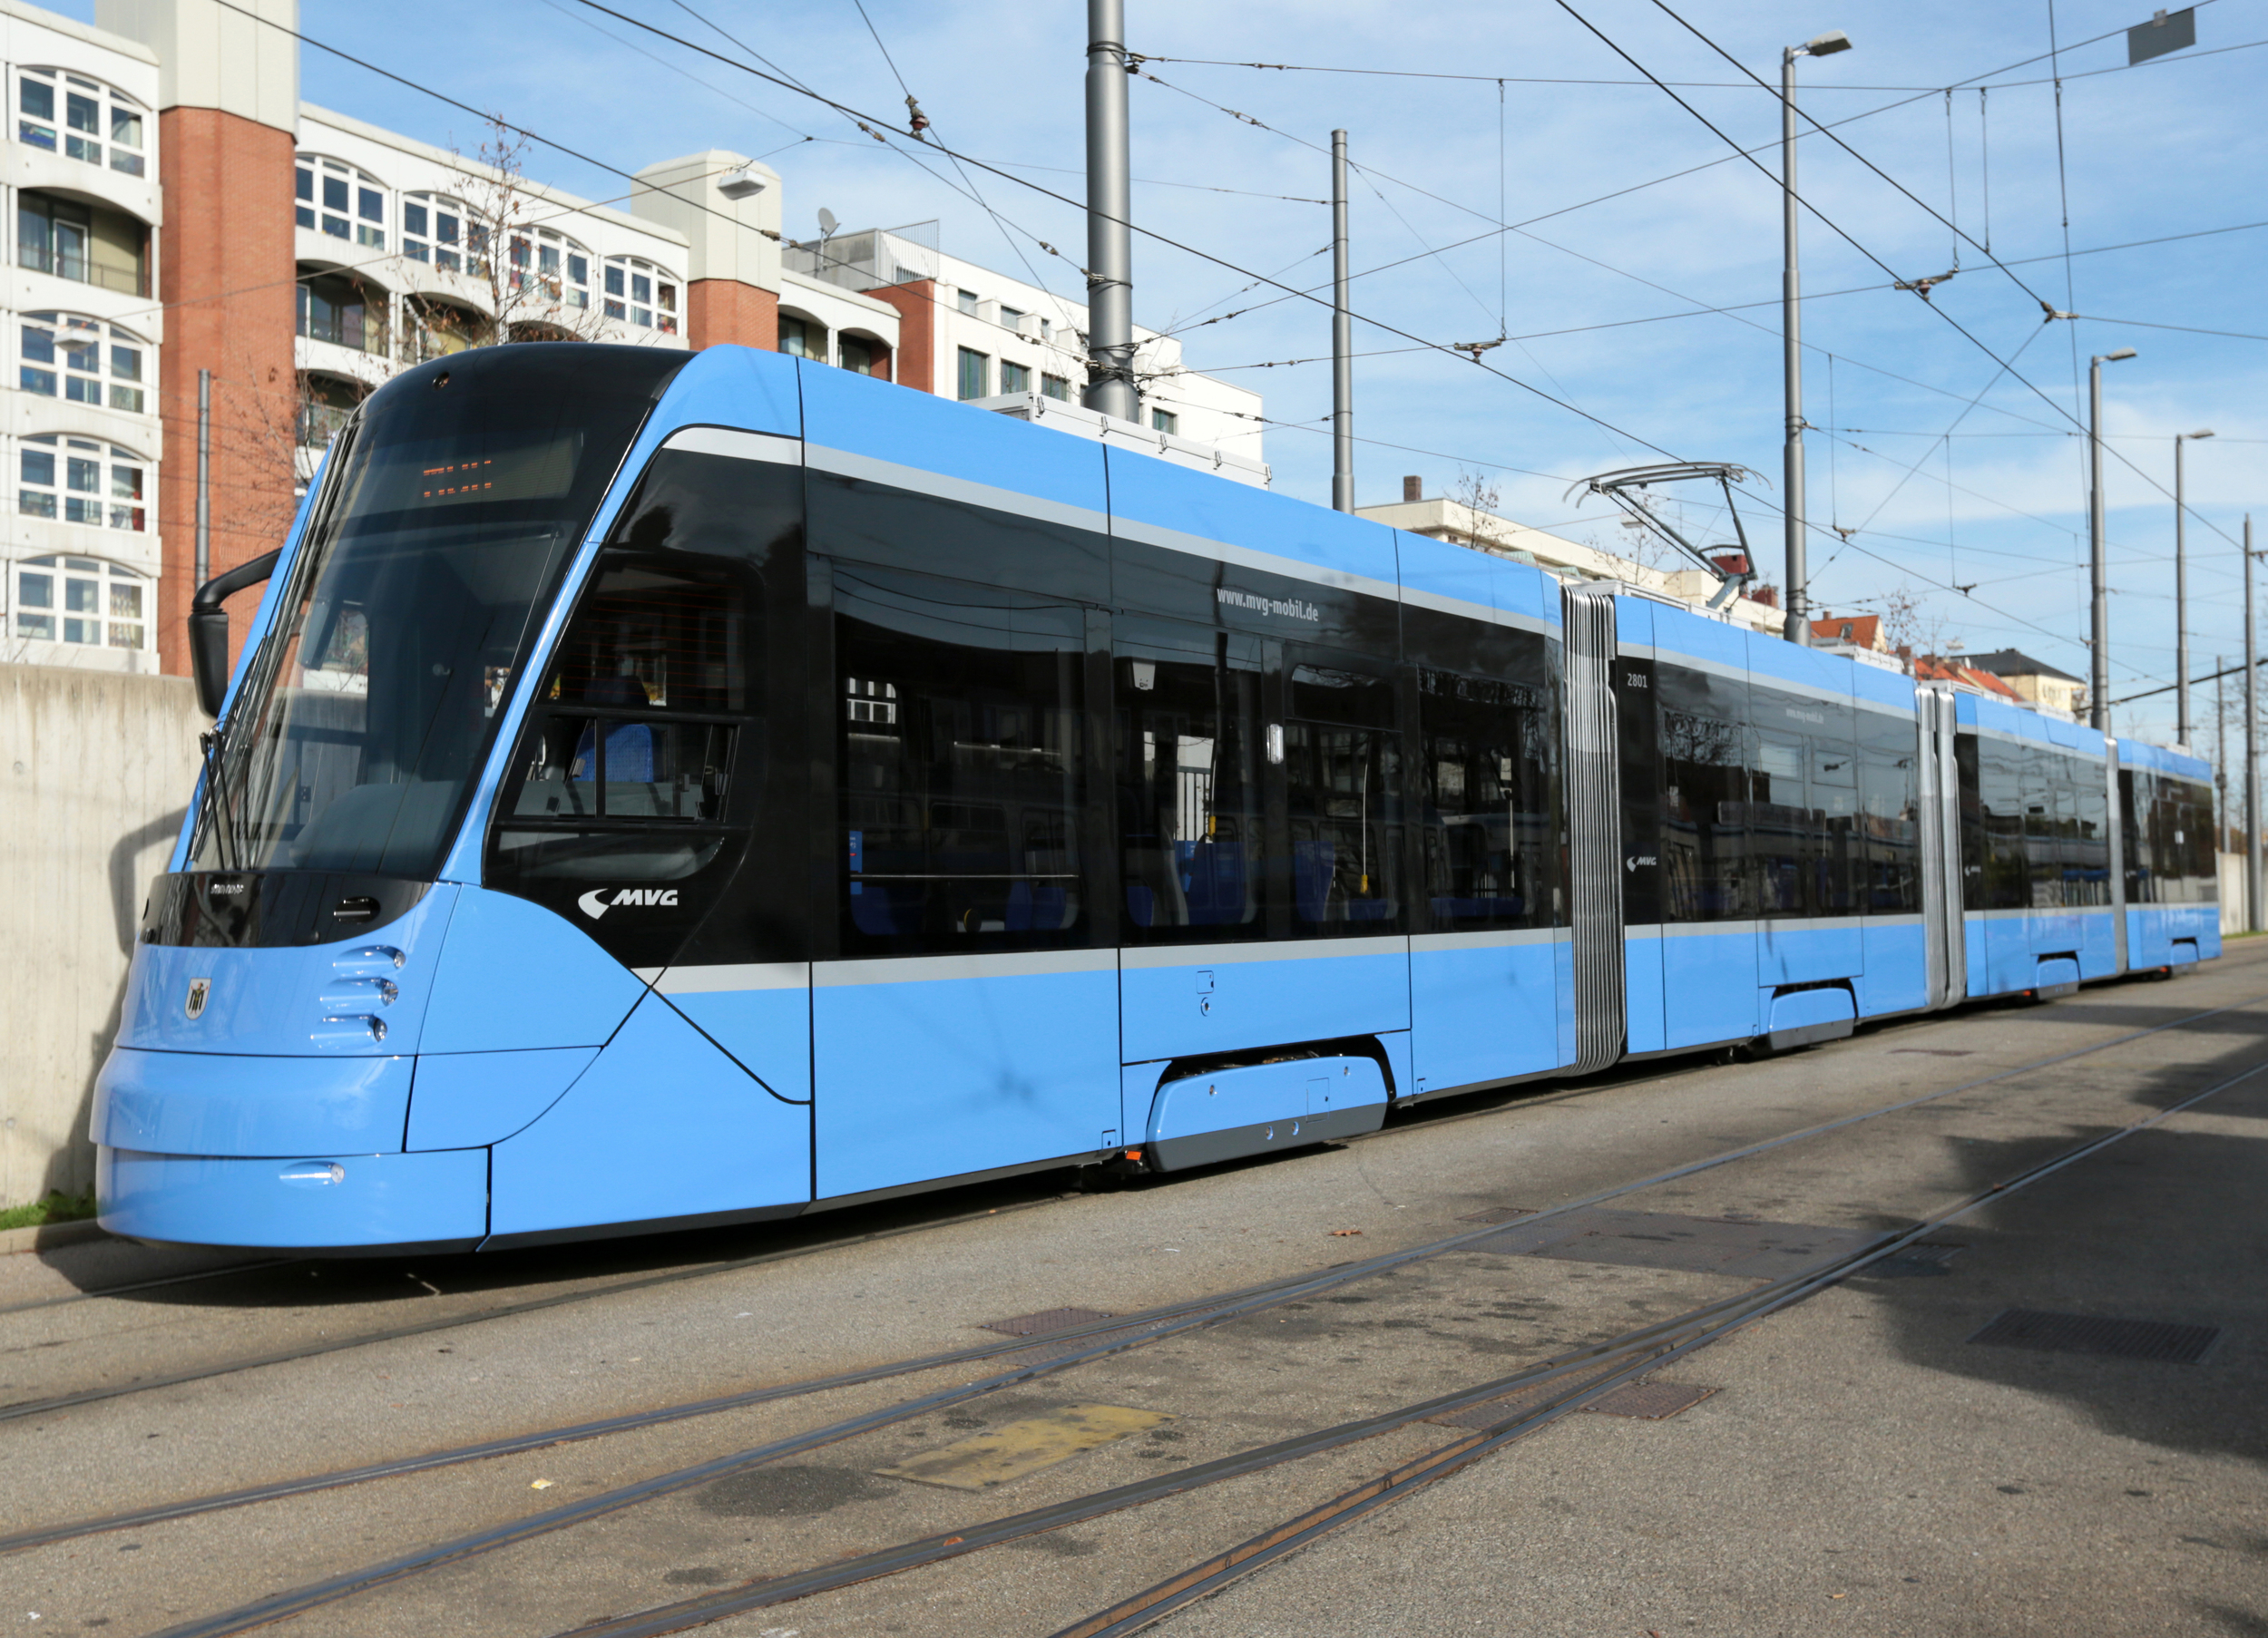 Dosud je v metropoli Bavorska provozováno 8 tramvají Siemens Avenio. (foto: Siemens)